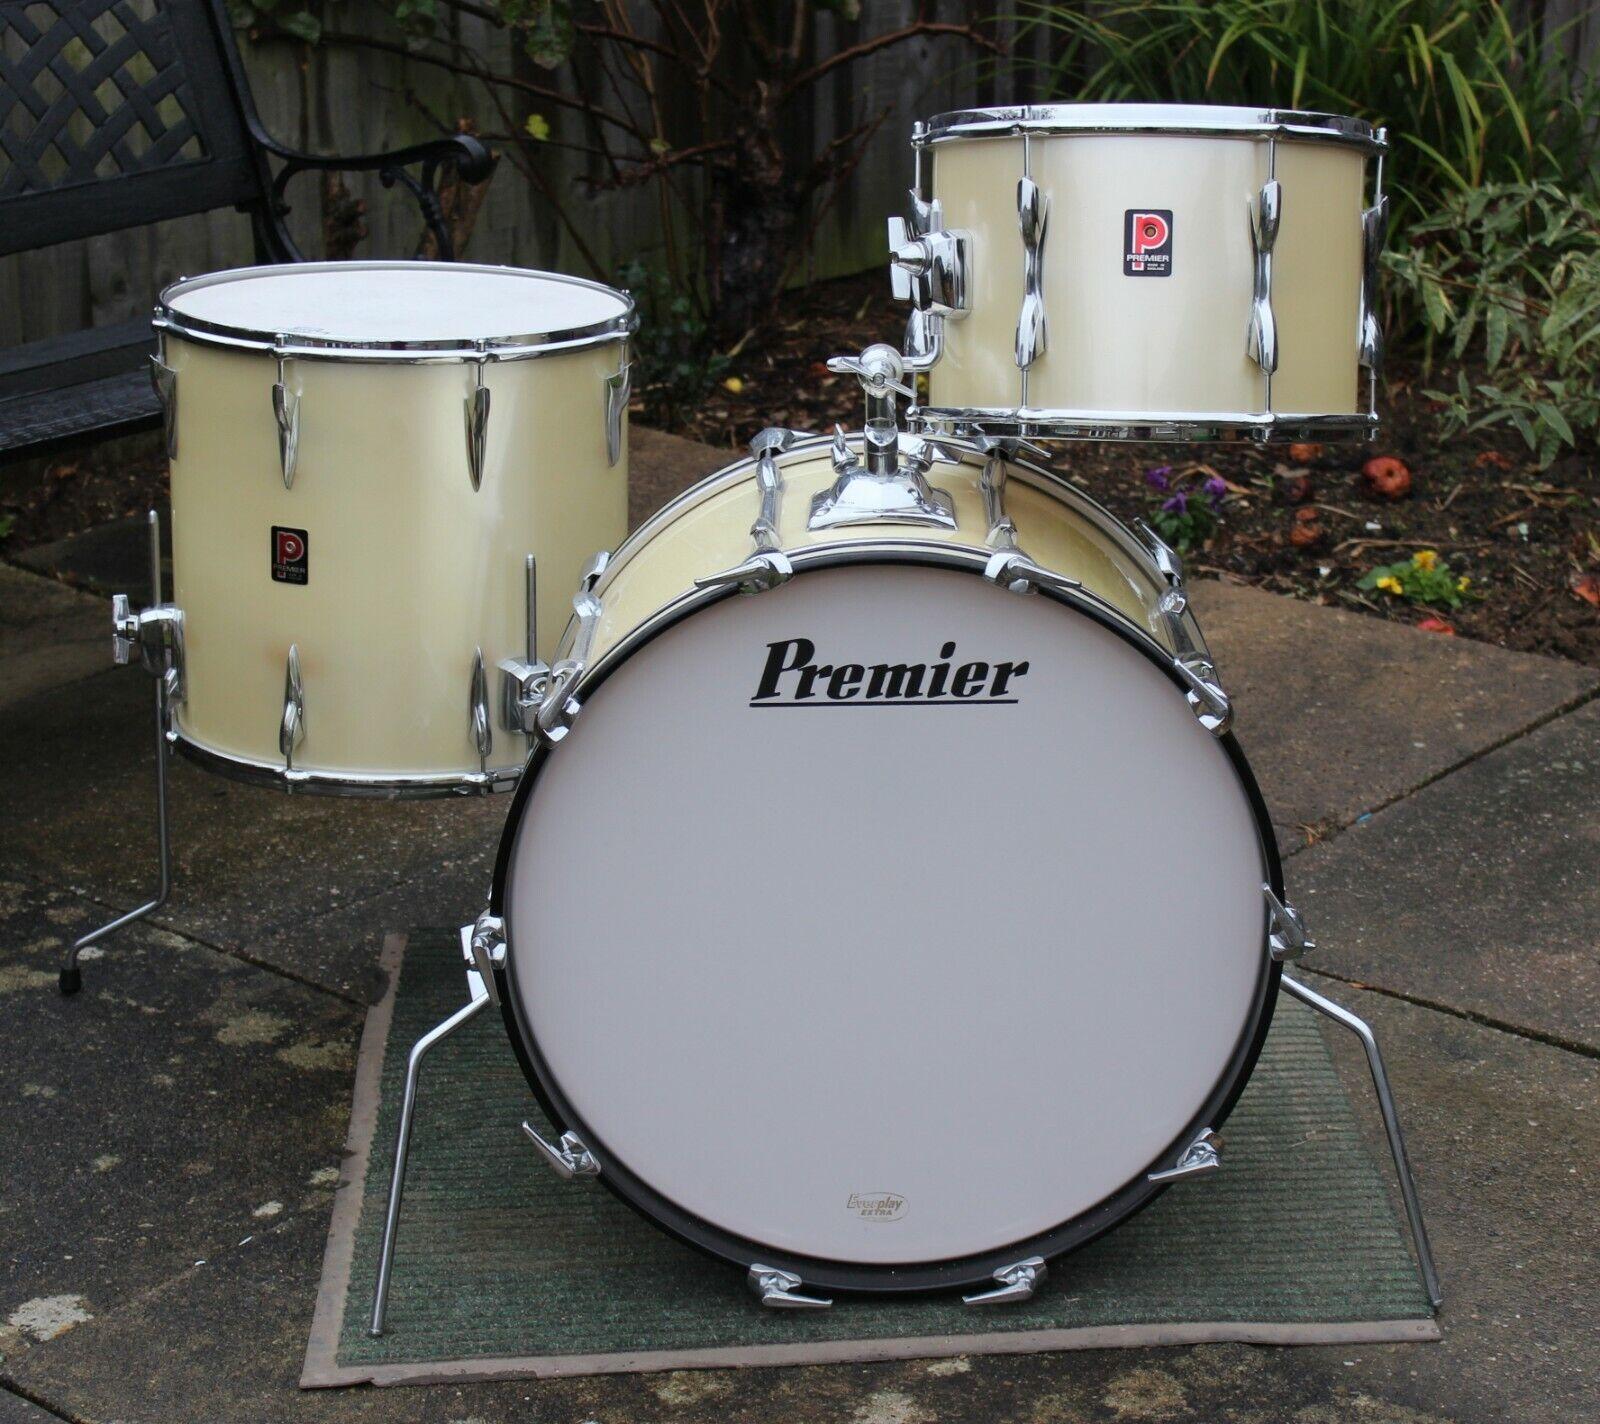 Vintage Premier Elite drum kit